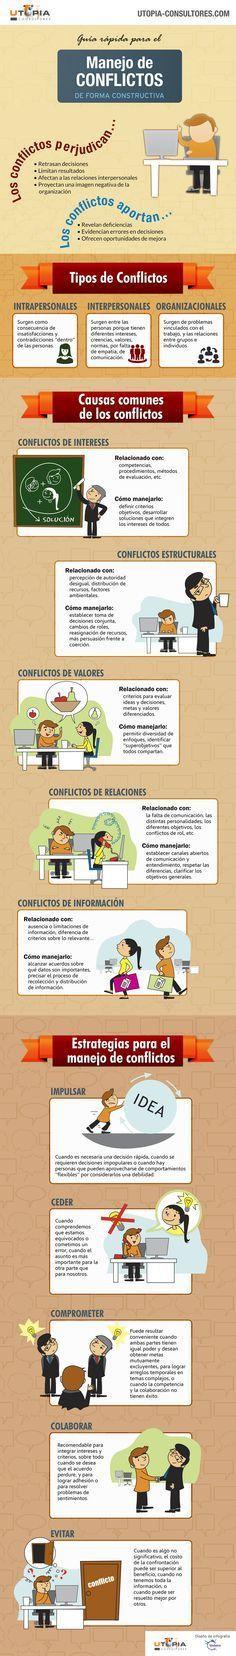 Psychology-Infographic-Conflictos-–-Guia-Rapida-para-Manejarlos-con Psychology Infographic : Conflictos – Guía Rápida para Manejarlos con Éxito